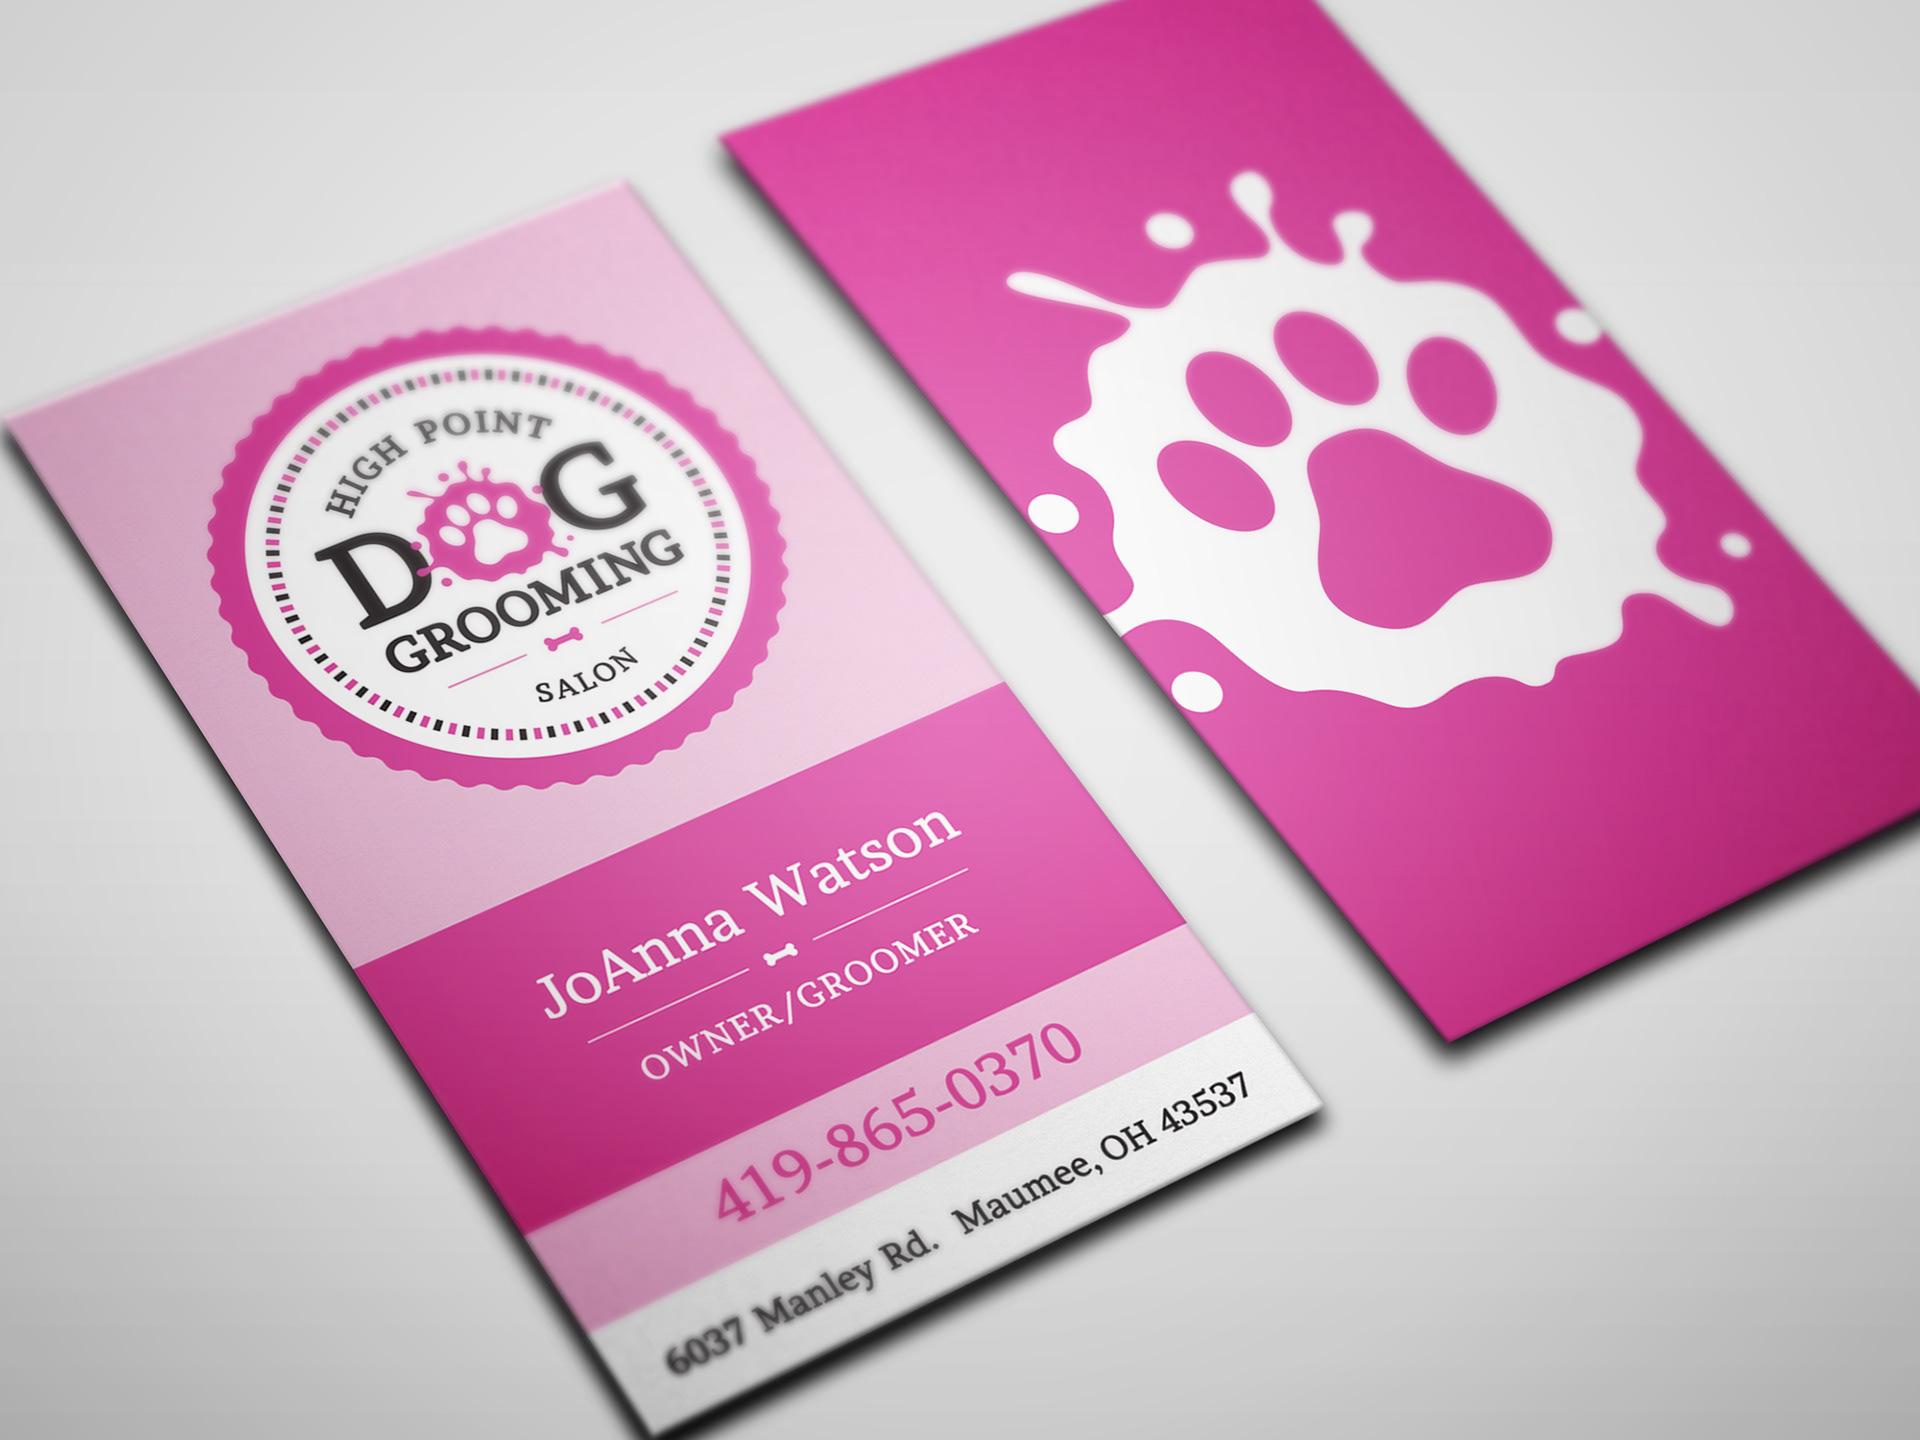 Dan Royer Designs - High Point Dog Grooming Brand Identity